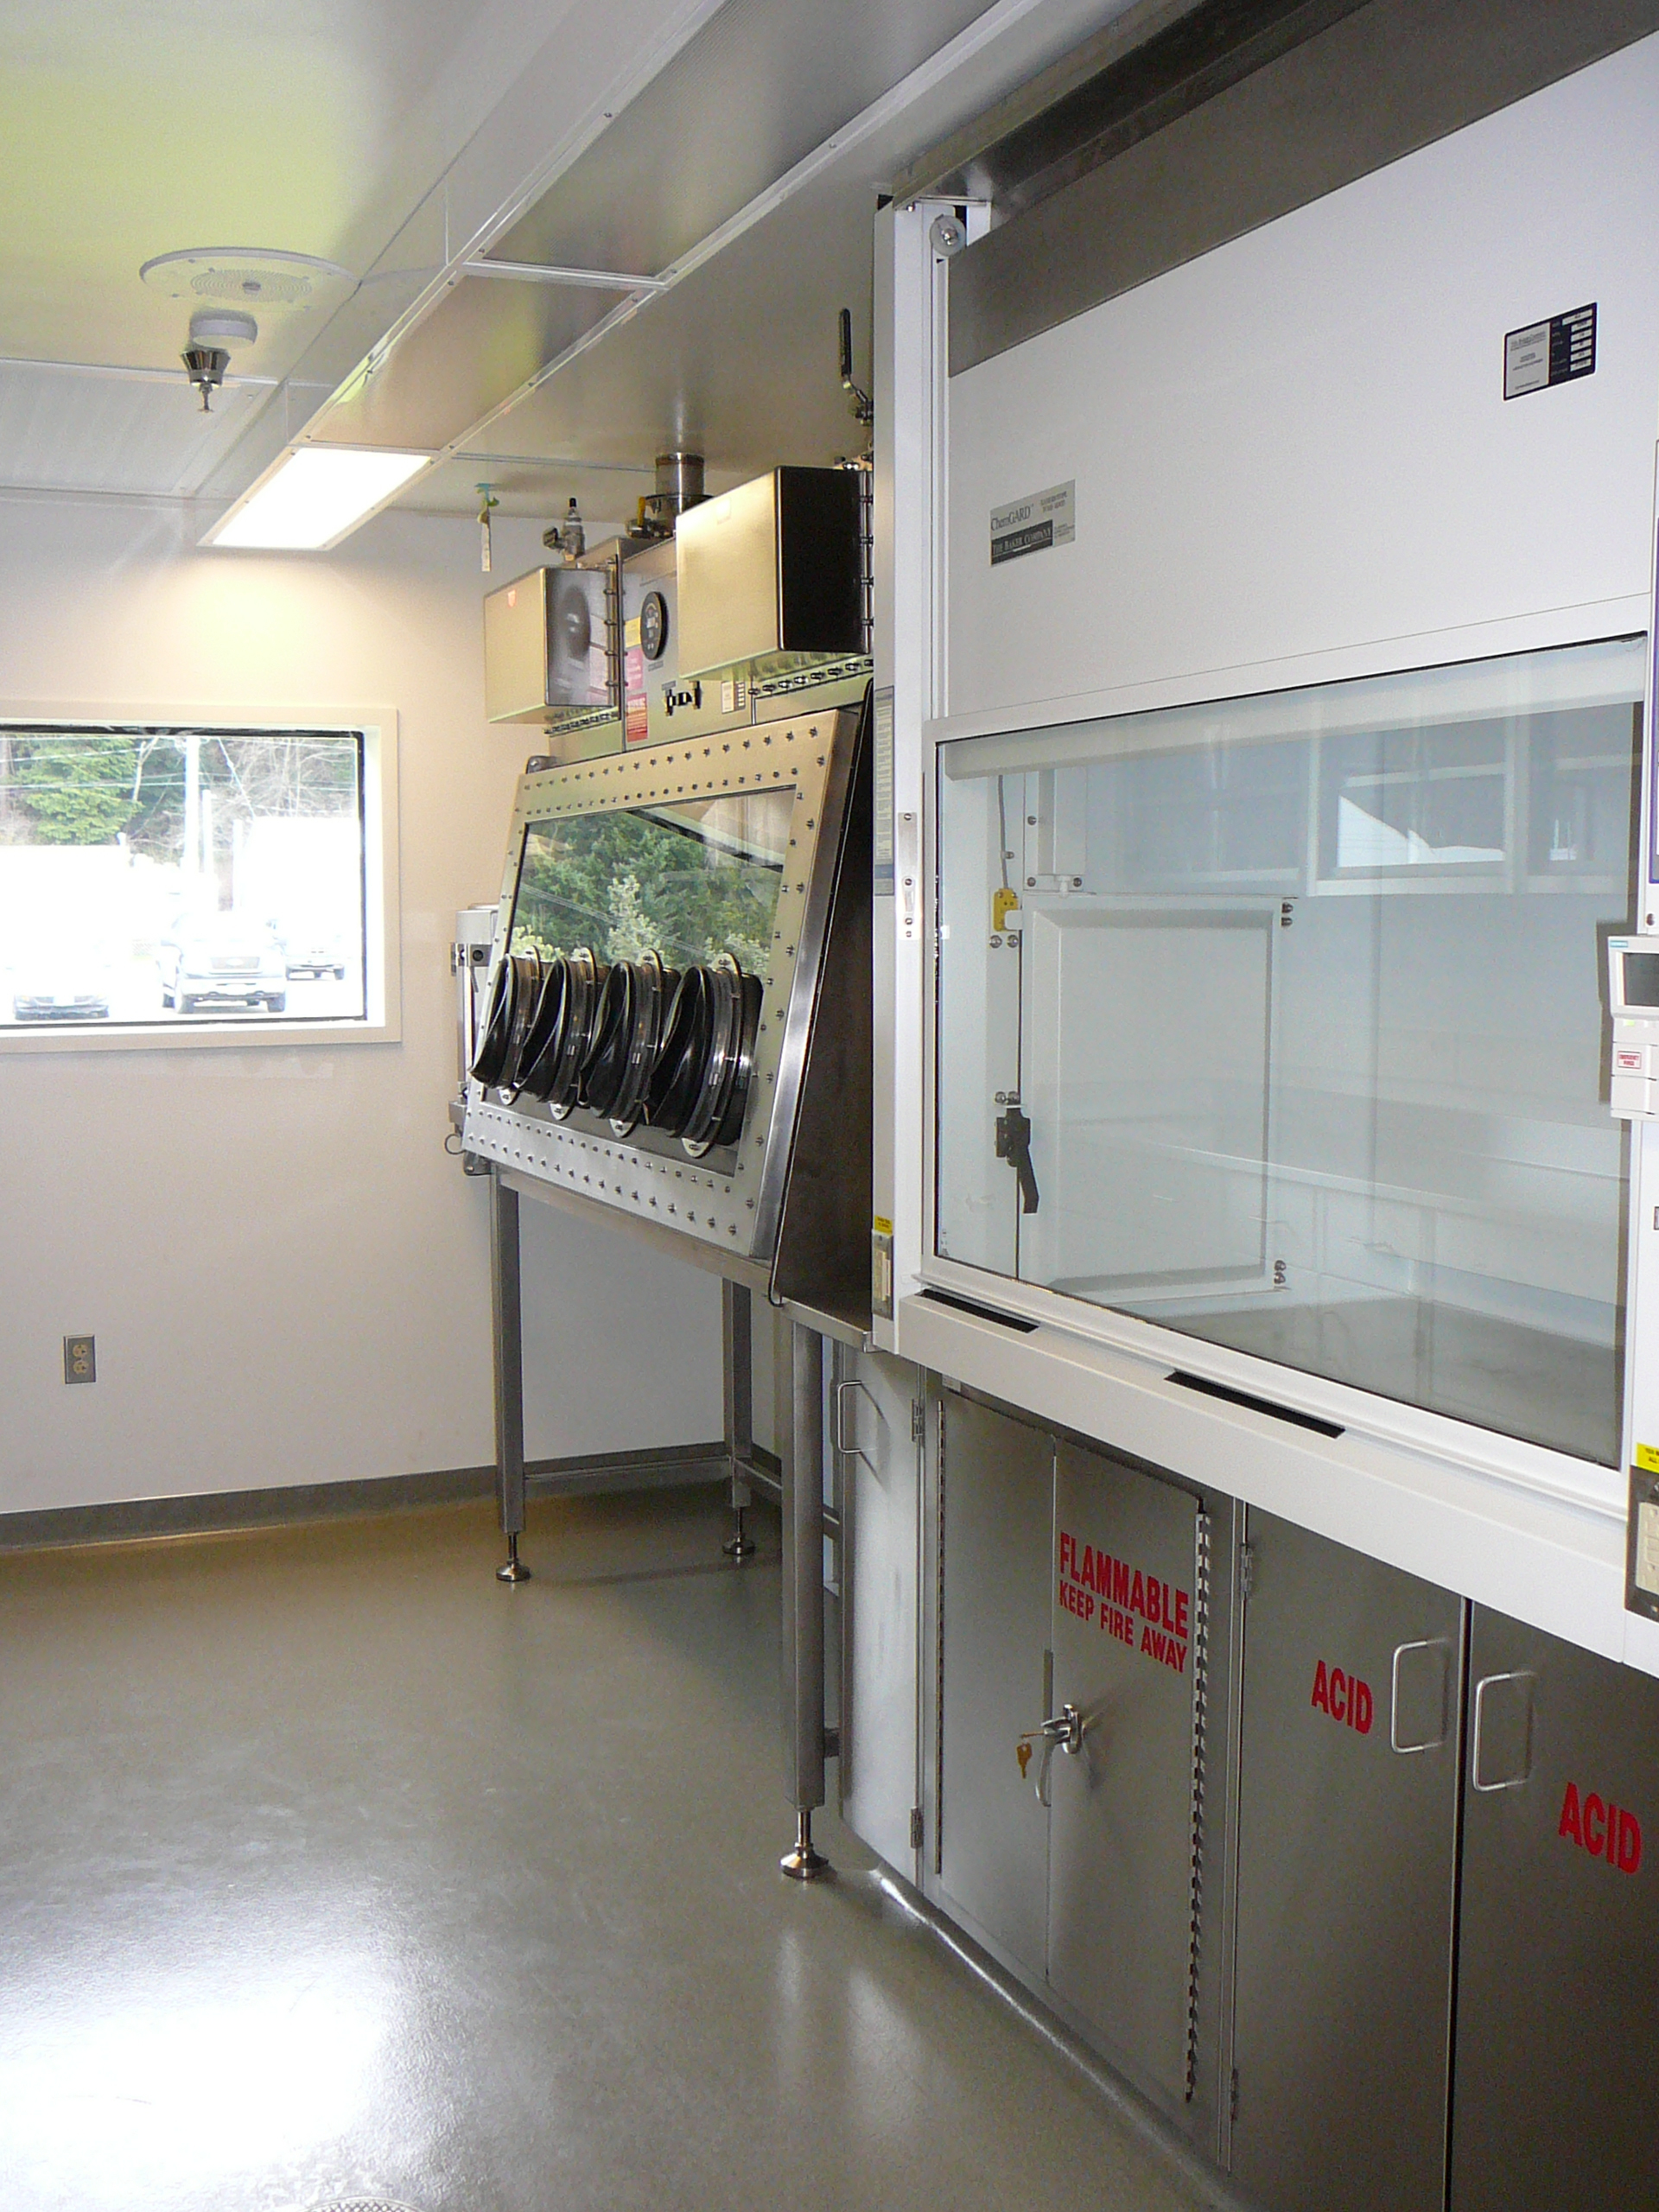 AHRF Laboratory